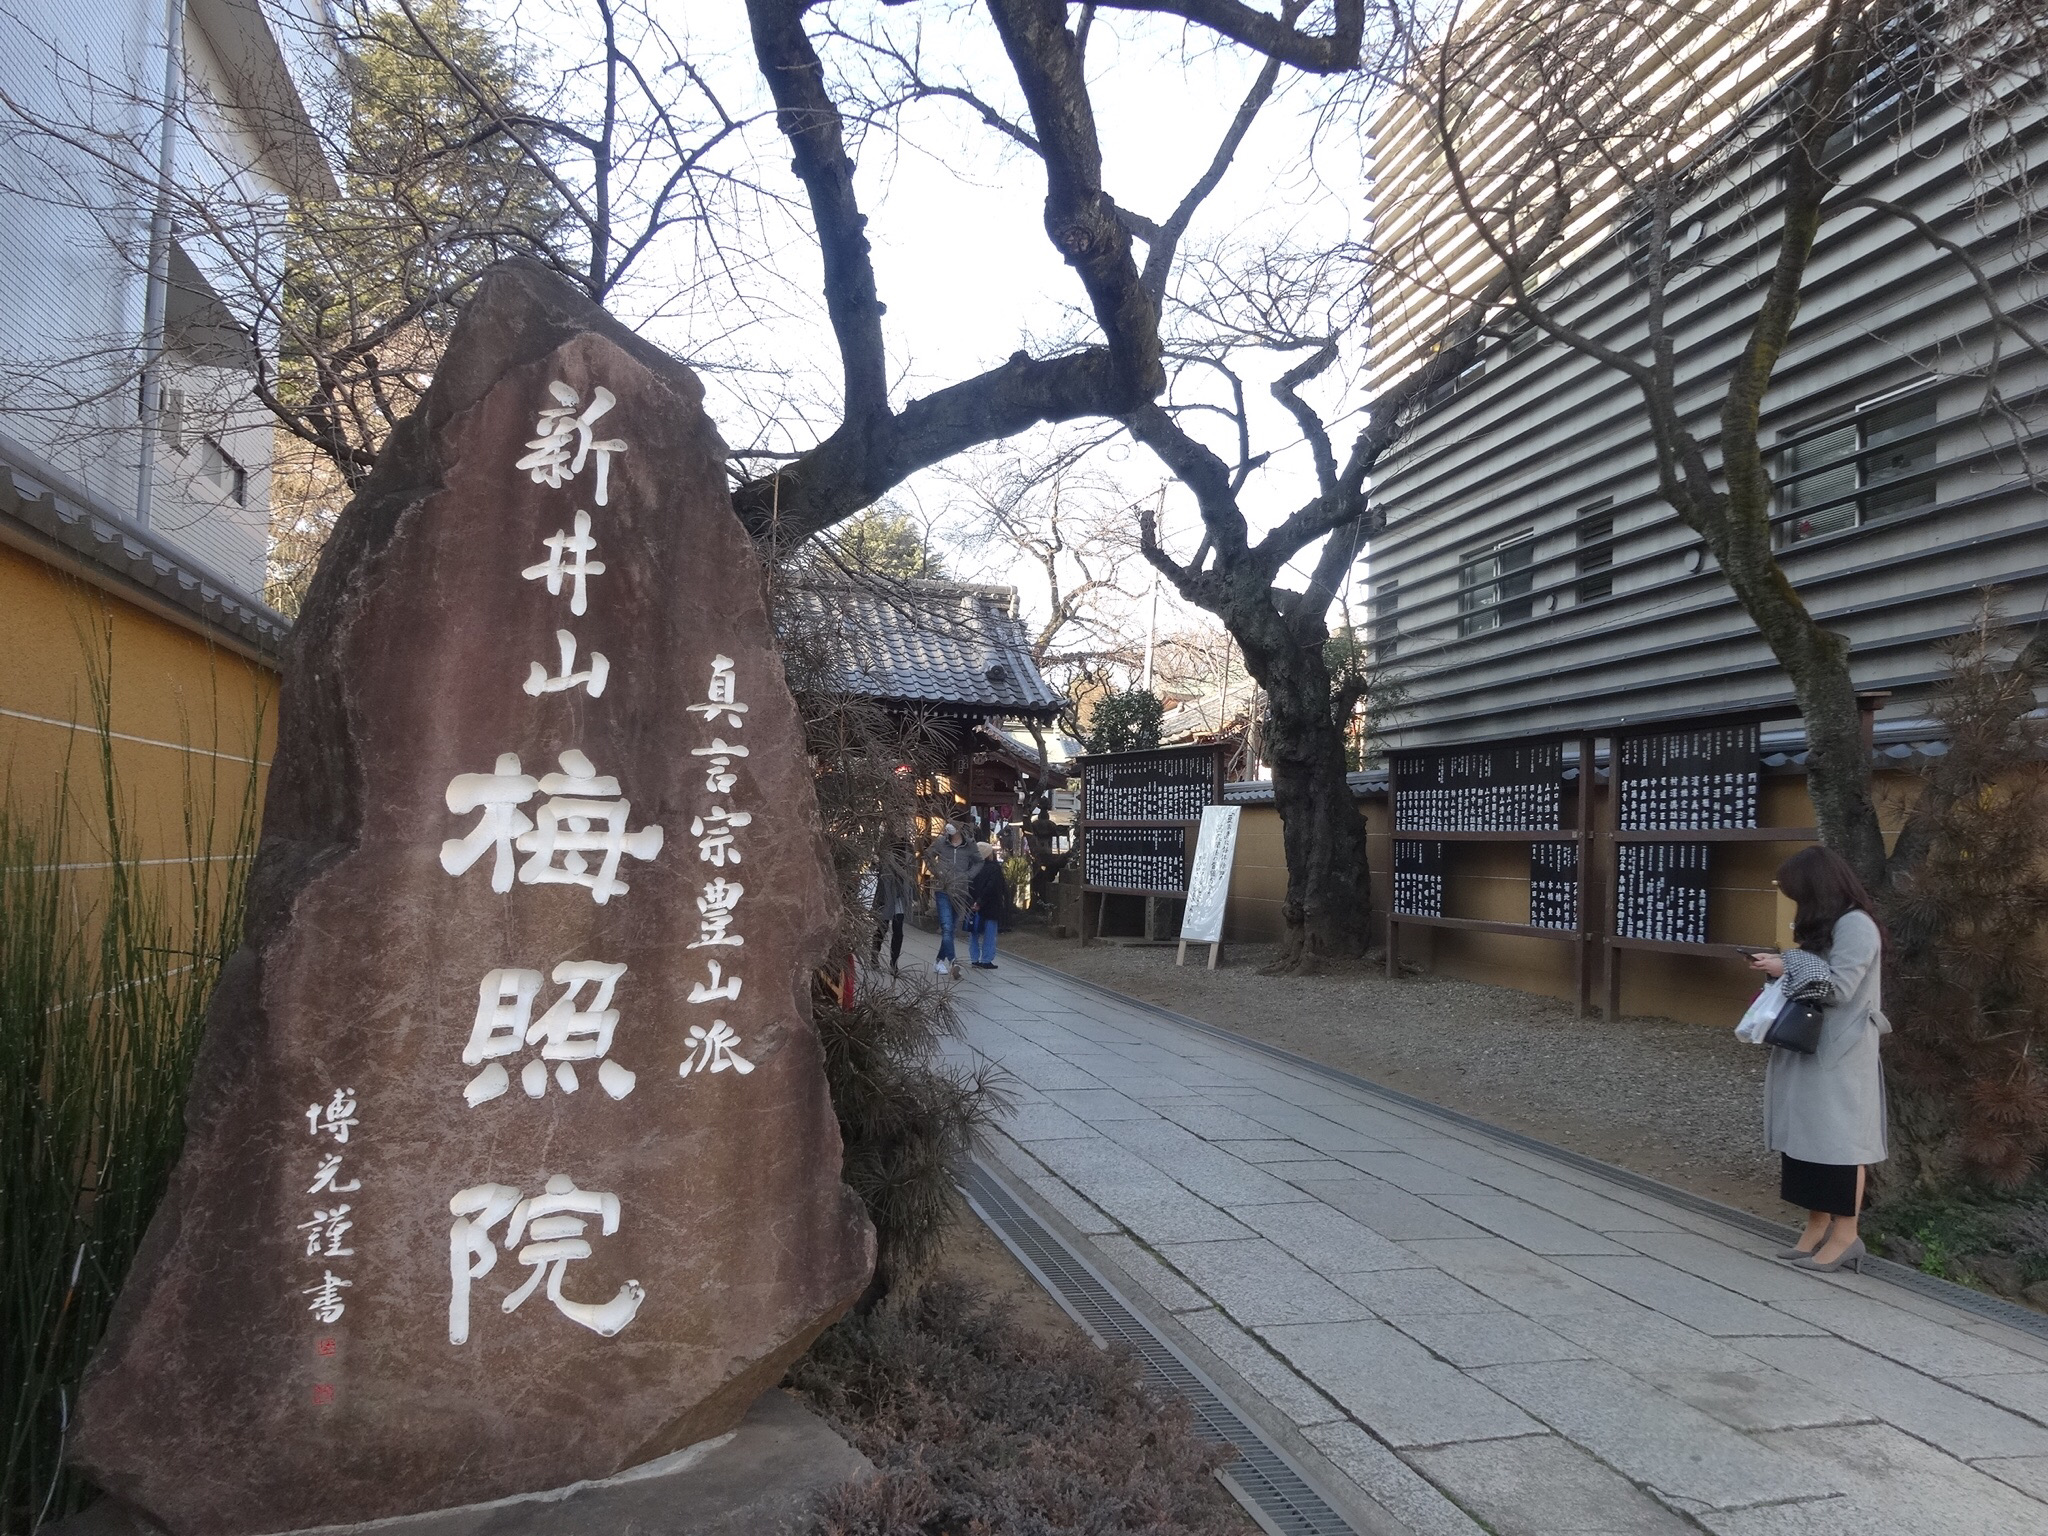 11月23日新井薬師梅照院で出張販売!